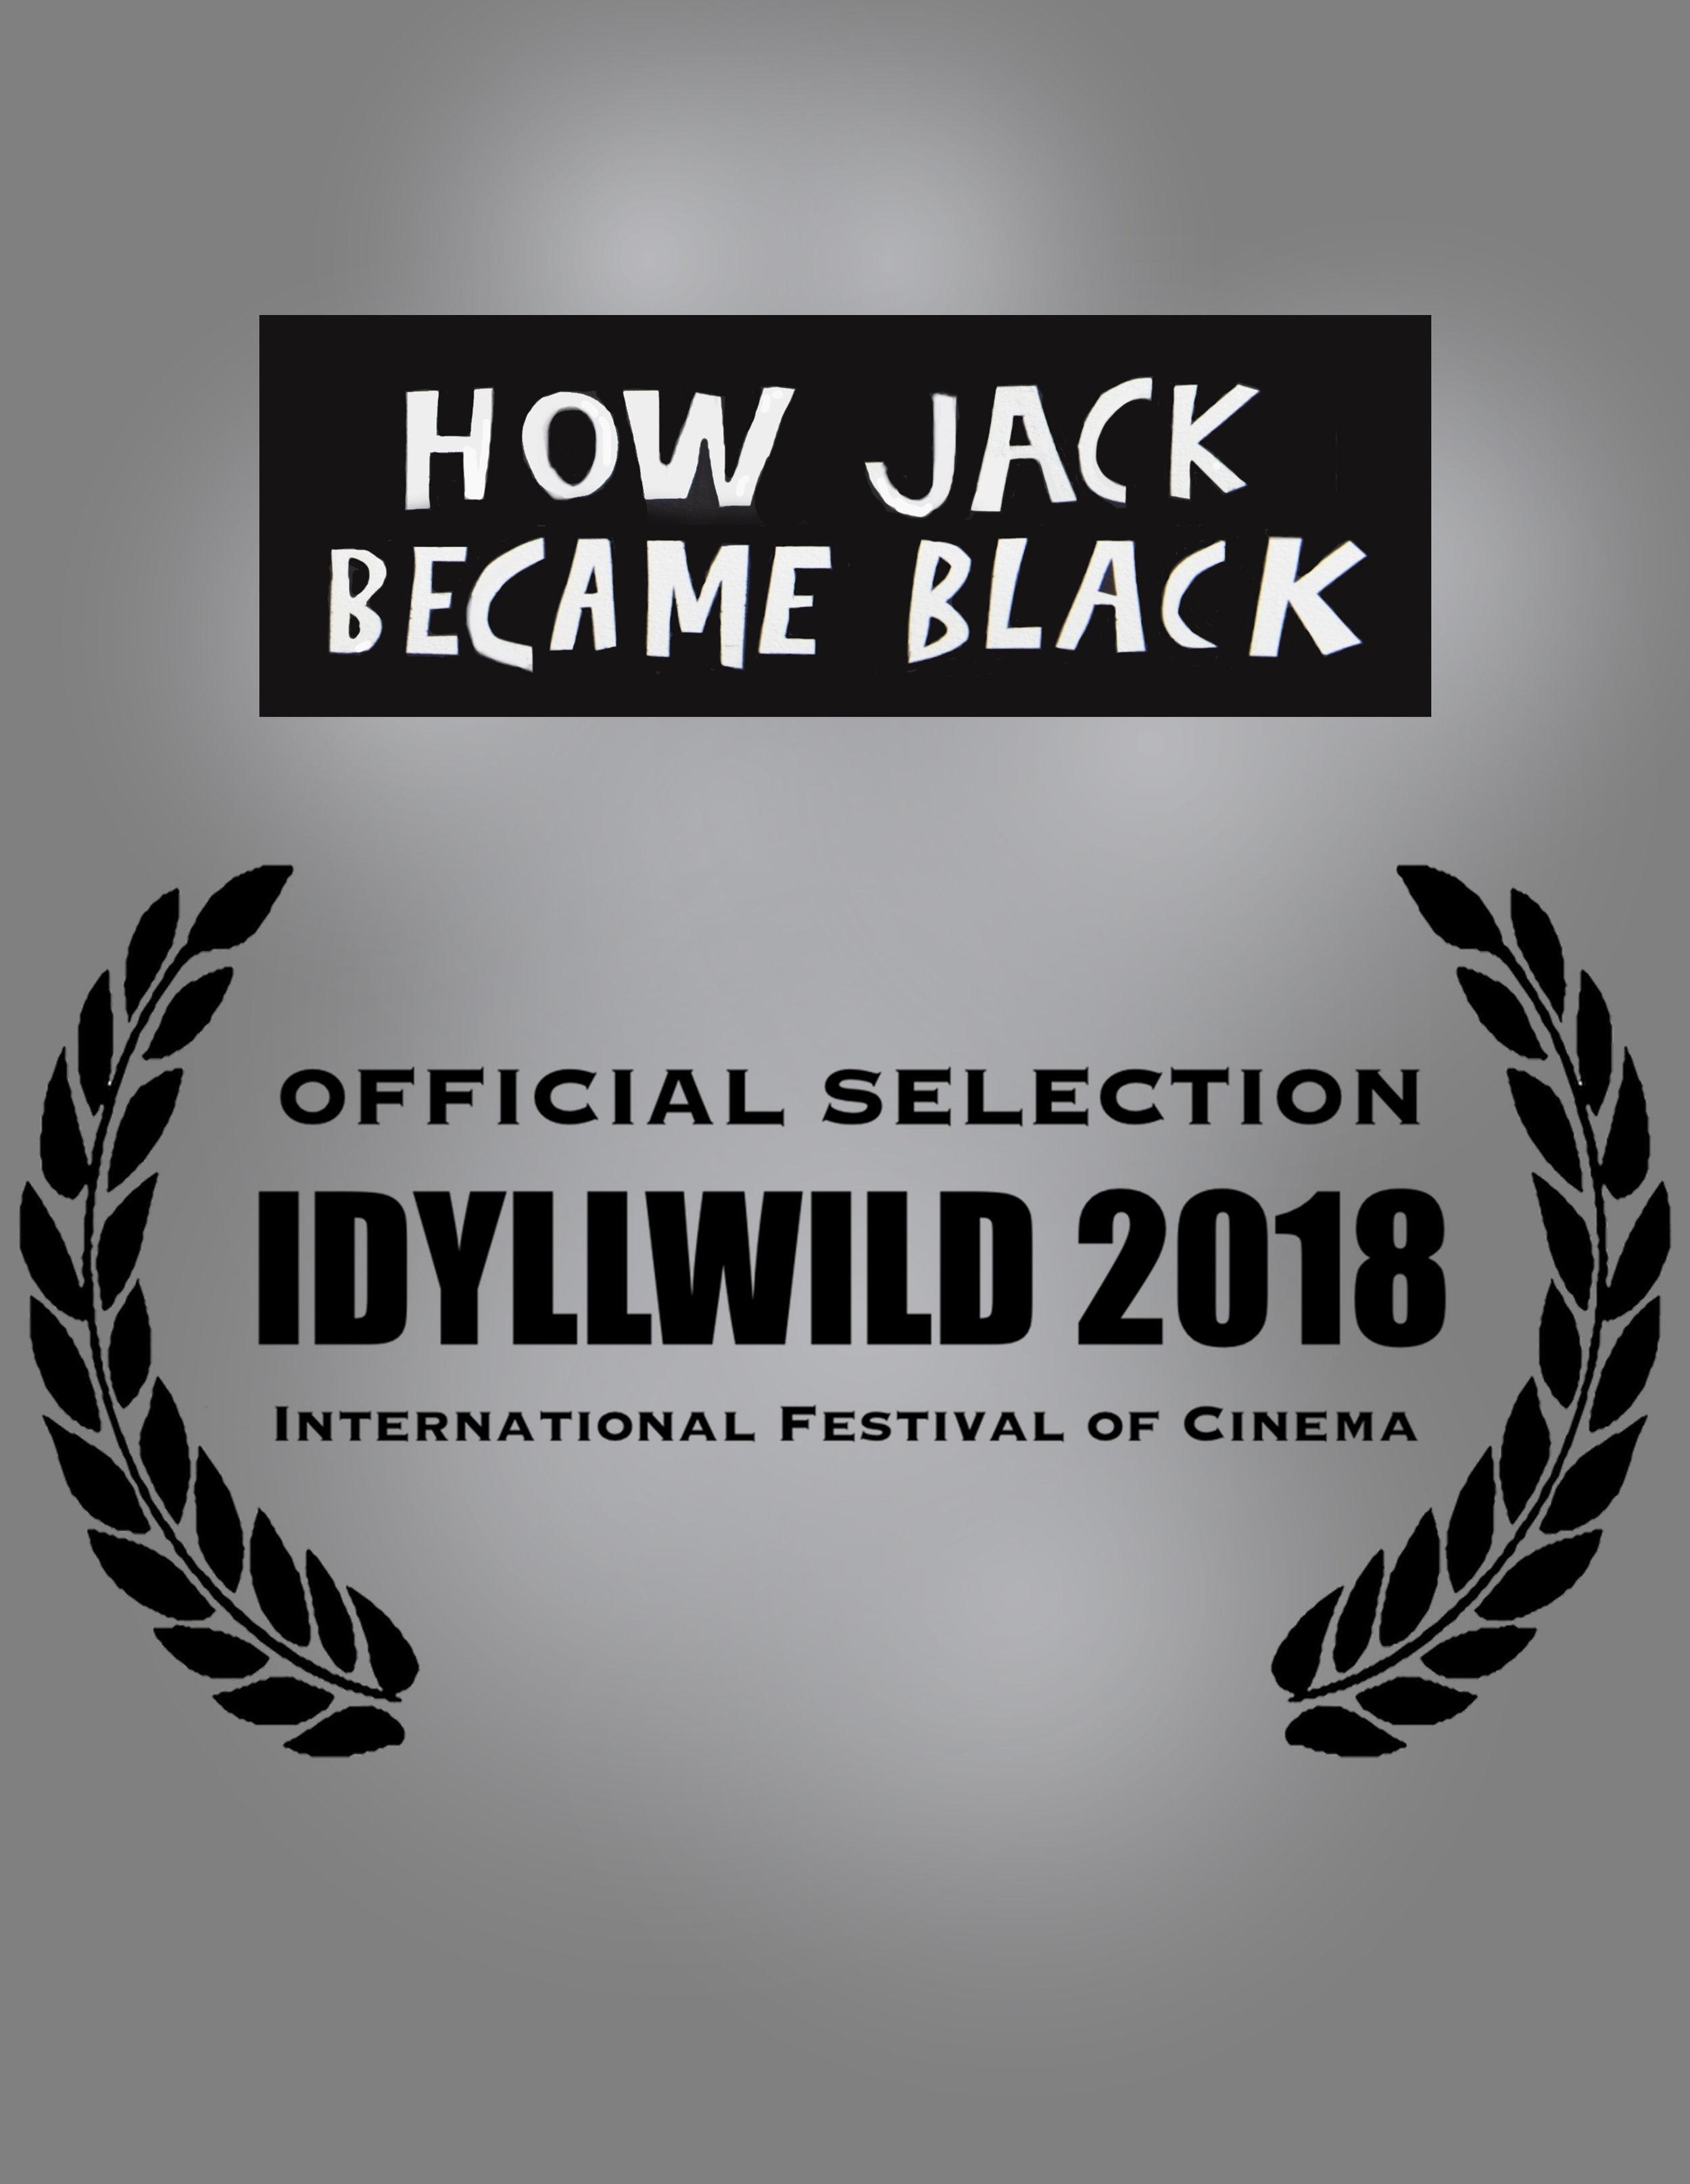 Idyllwild.jpg